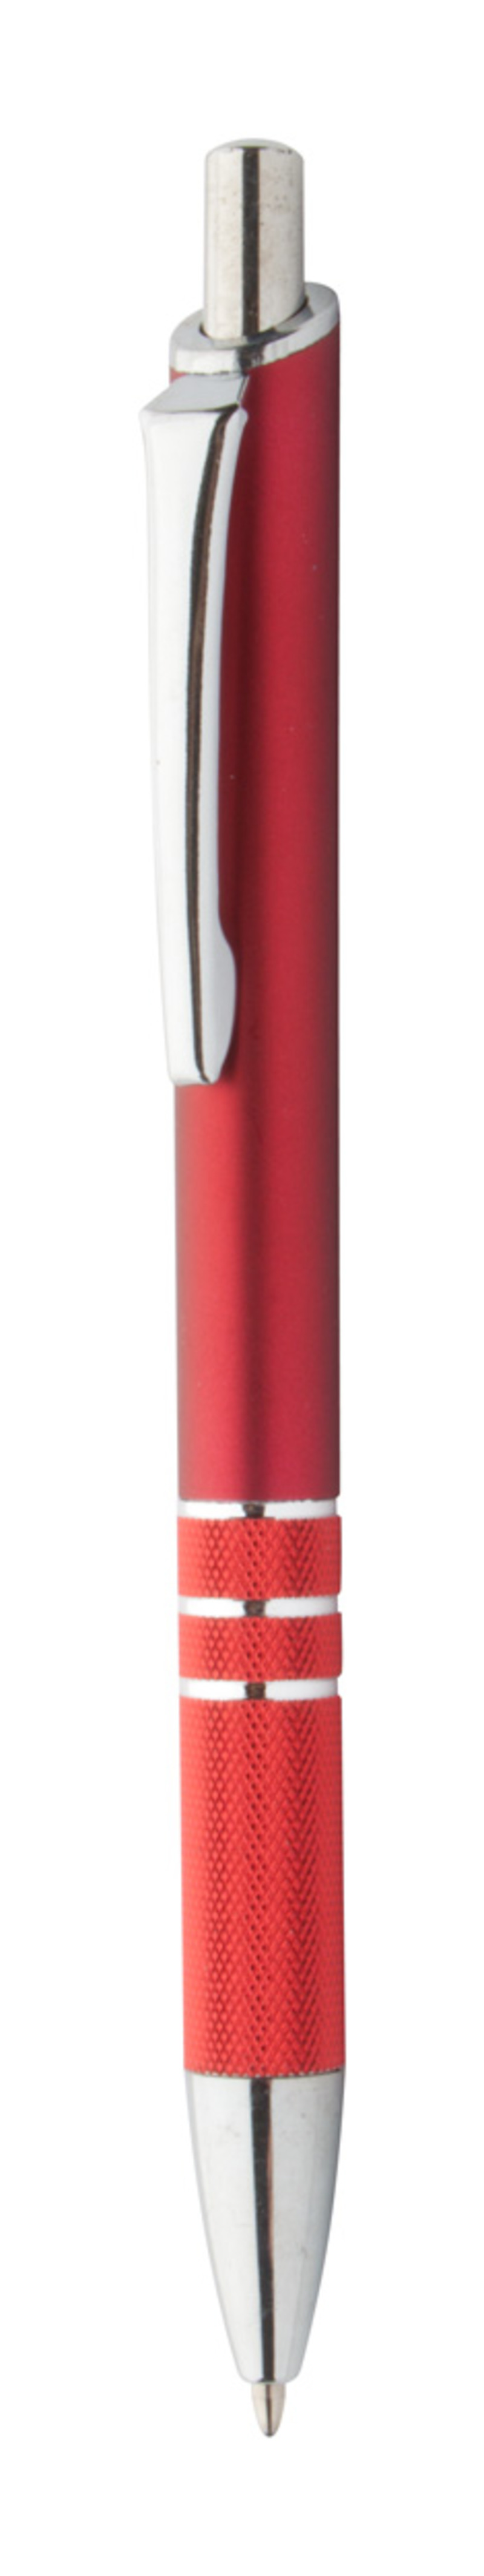 Lane ballpoint pen